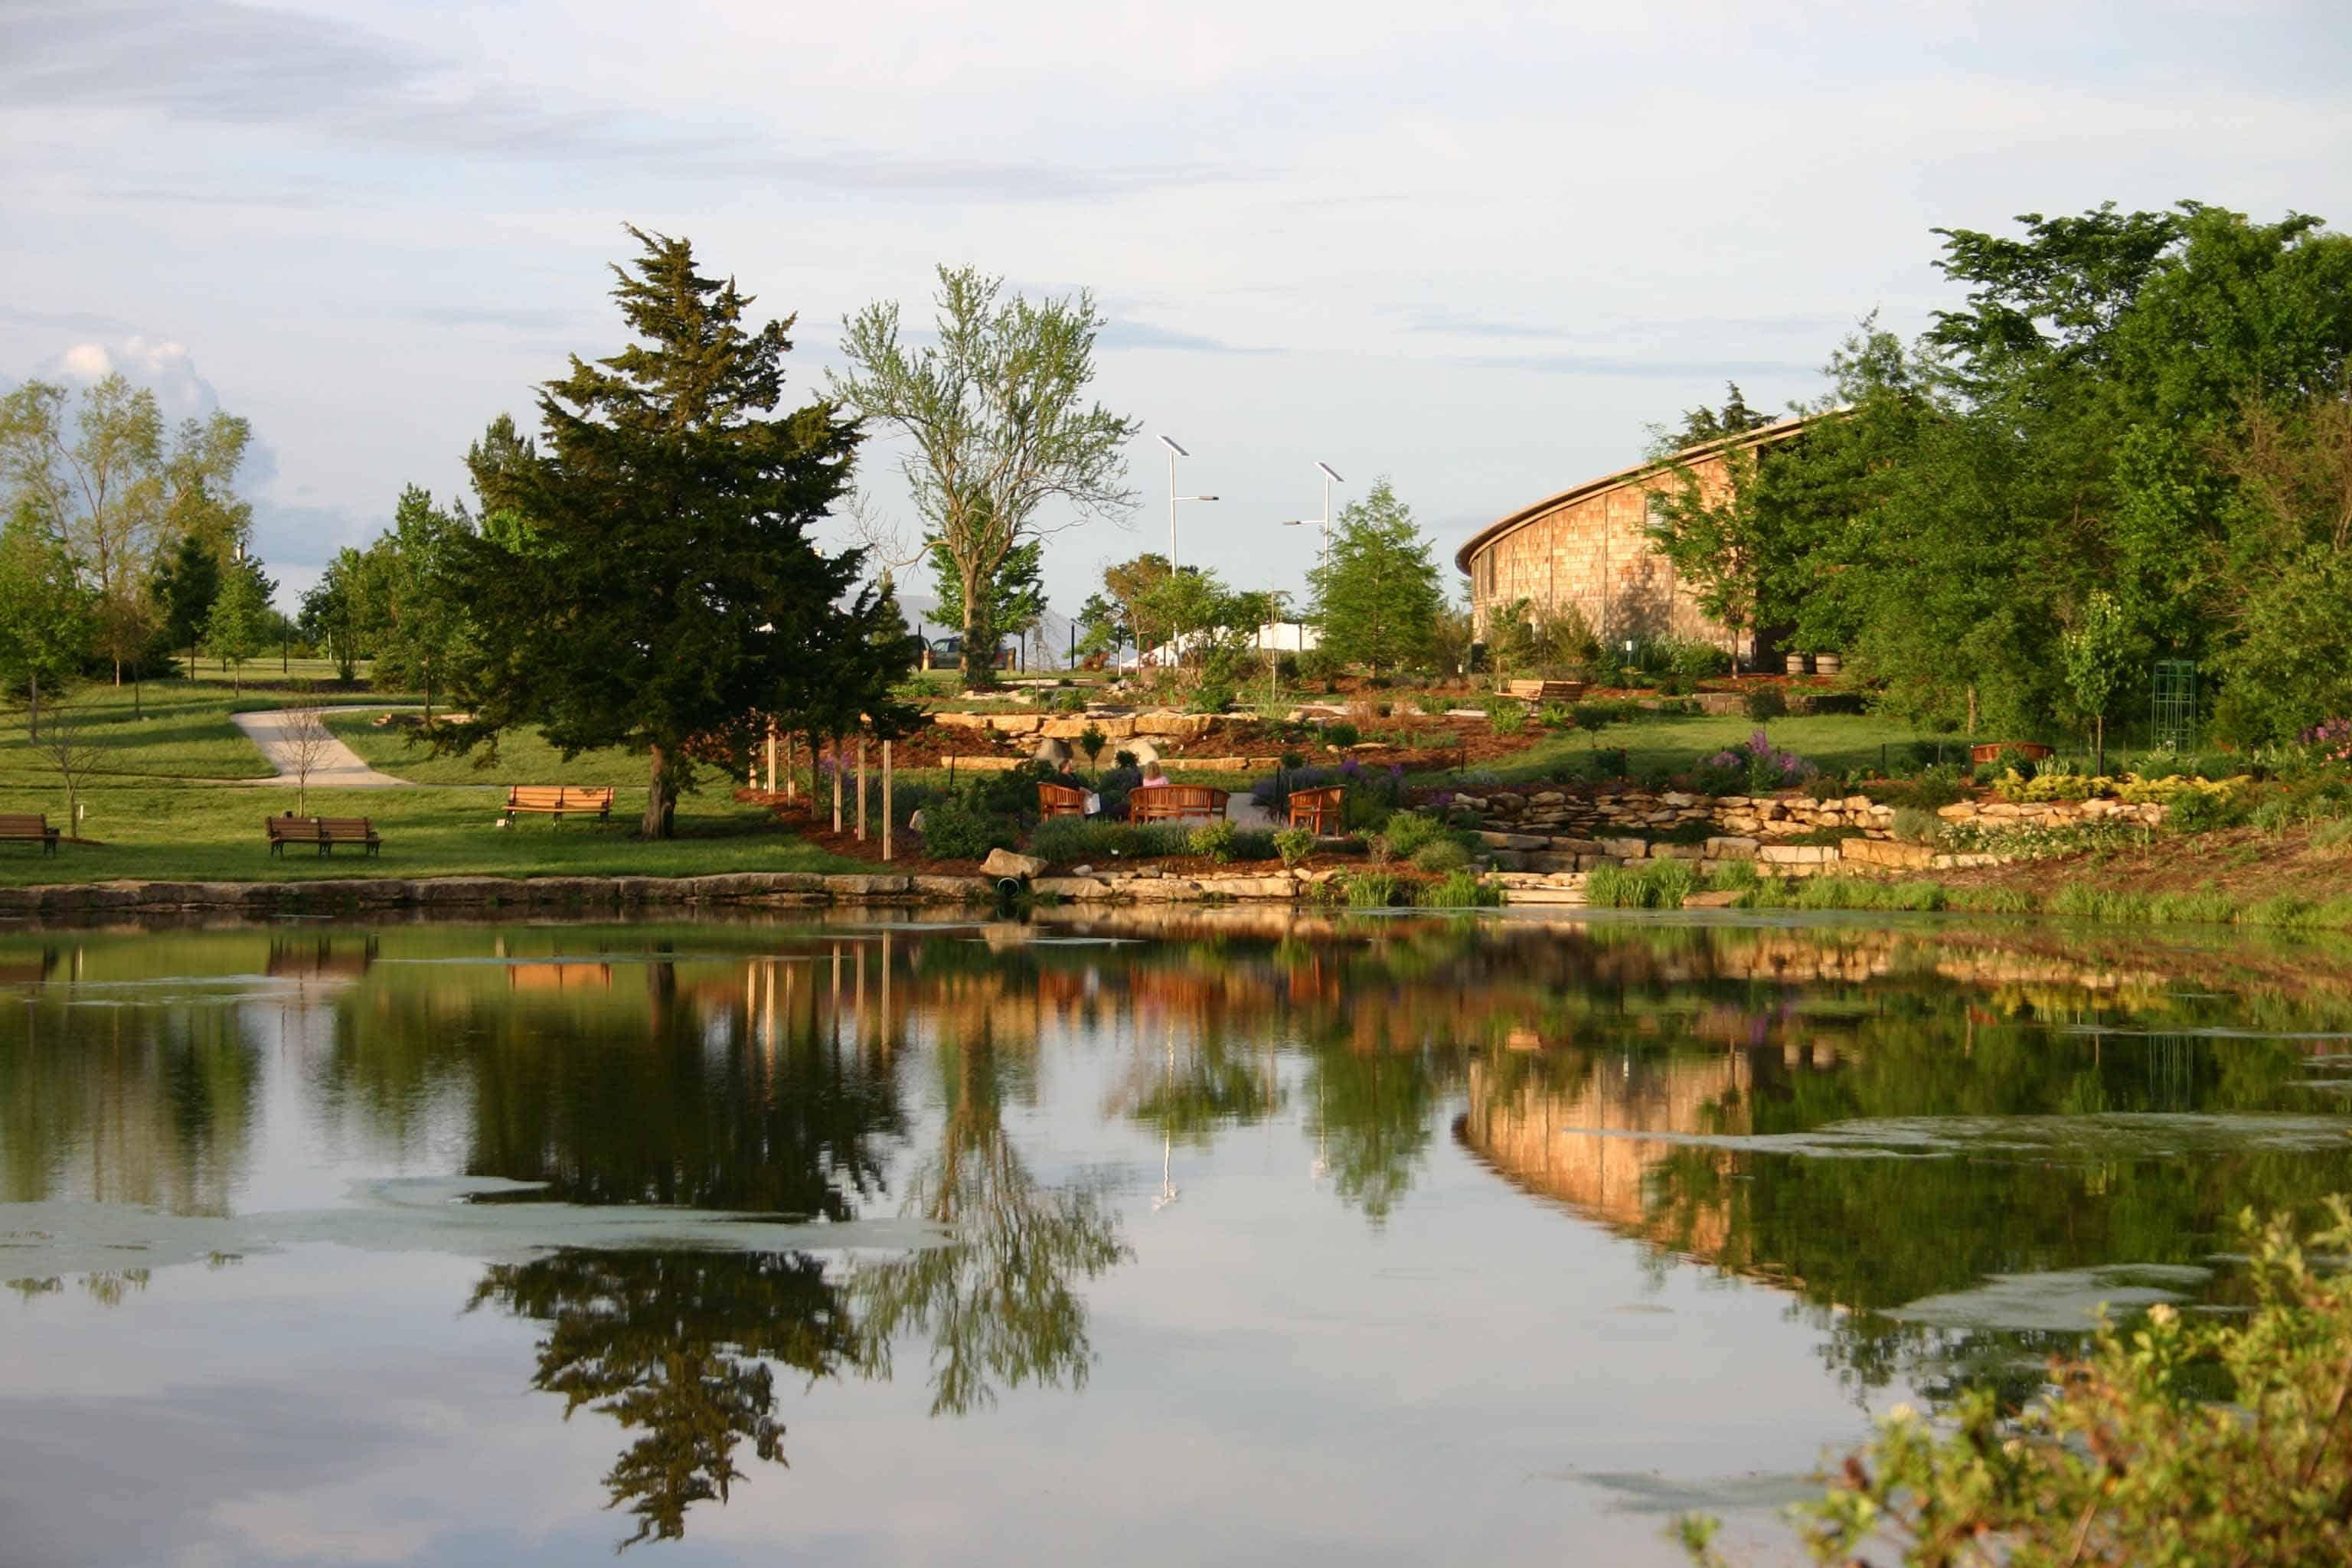 overland-park-arboretum-botanical-gardens - Savvy Bridal